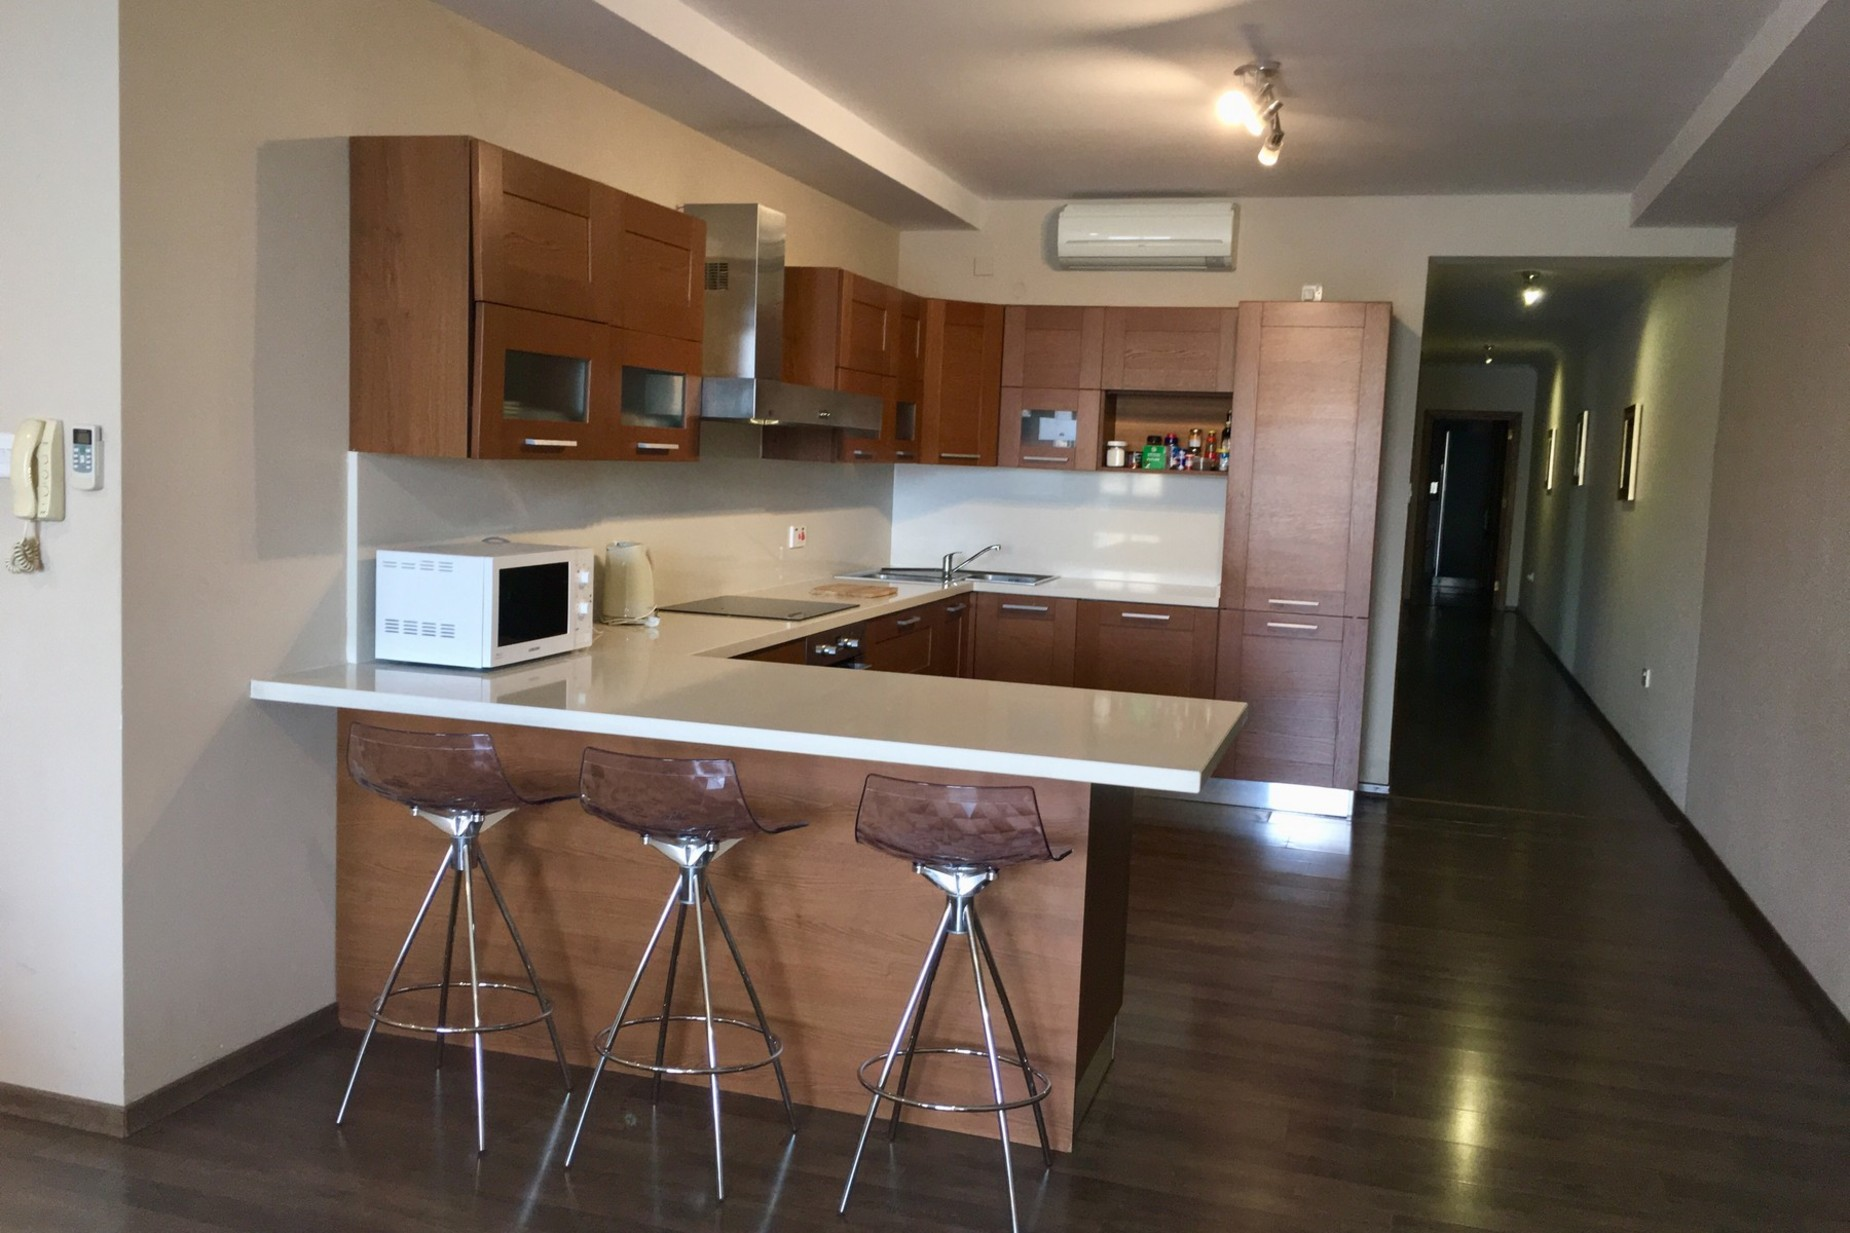 3 bed Apartment For Sale in Vittoriosa, Vittoriosa - thumb 2